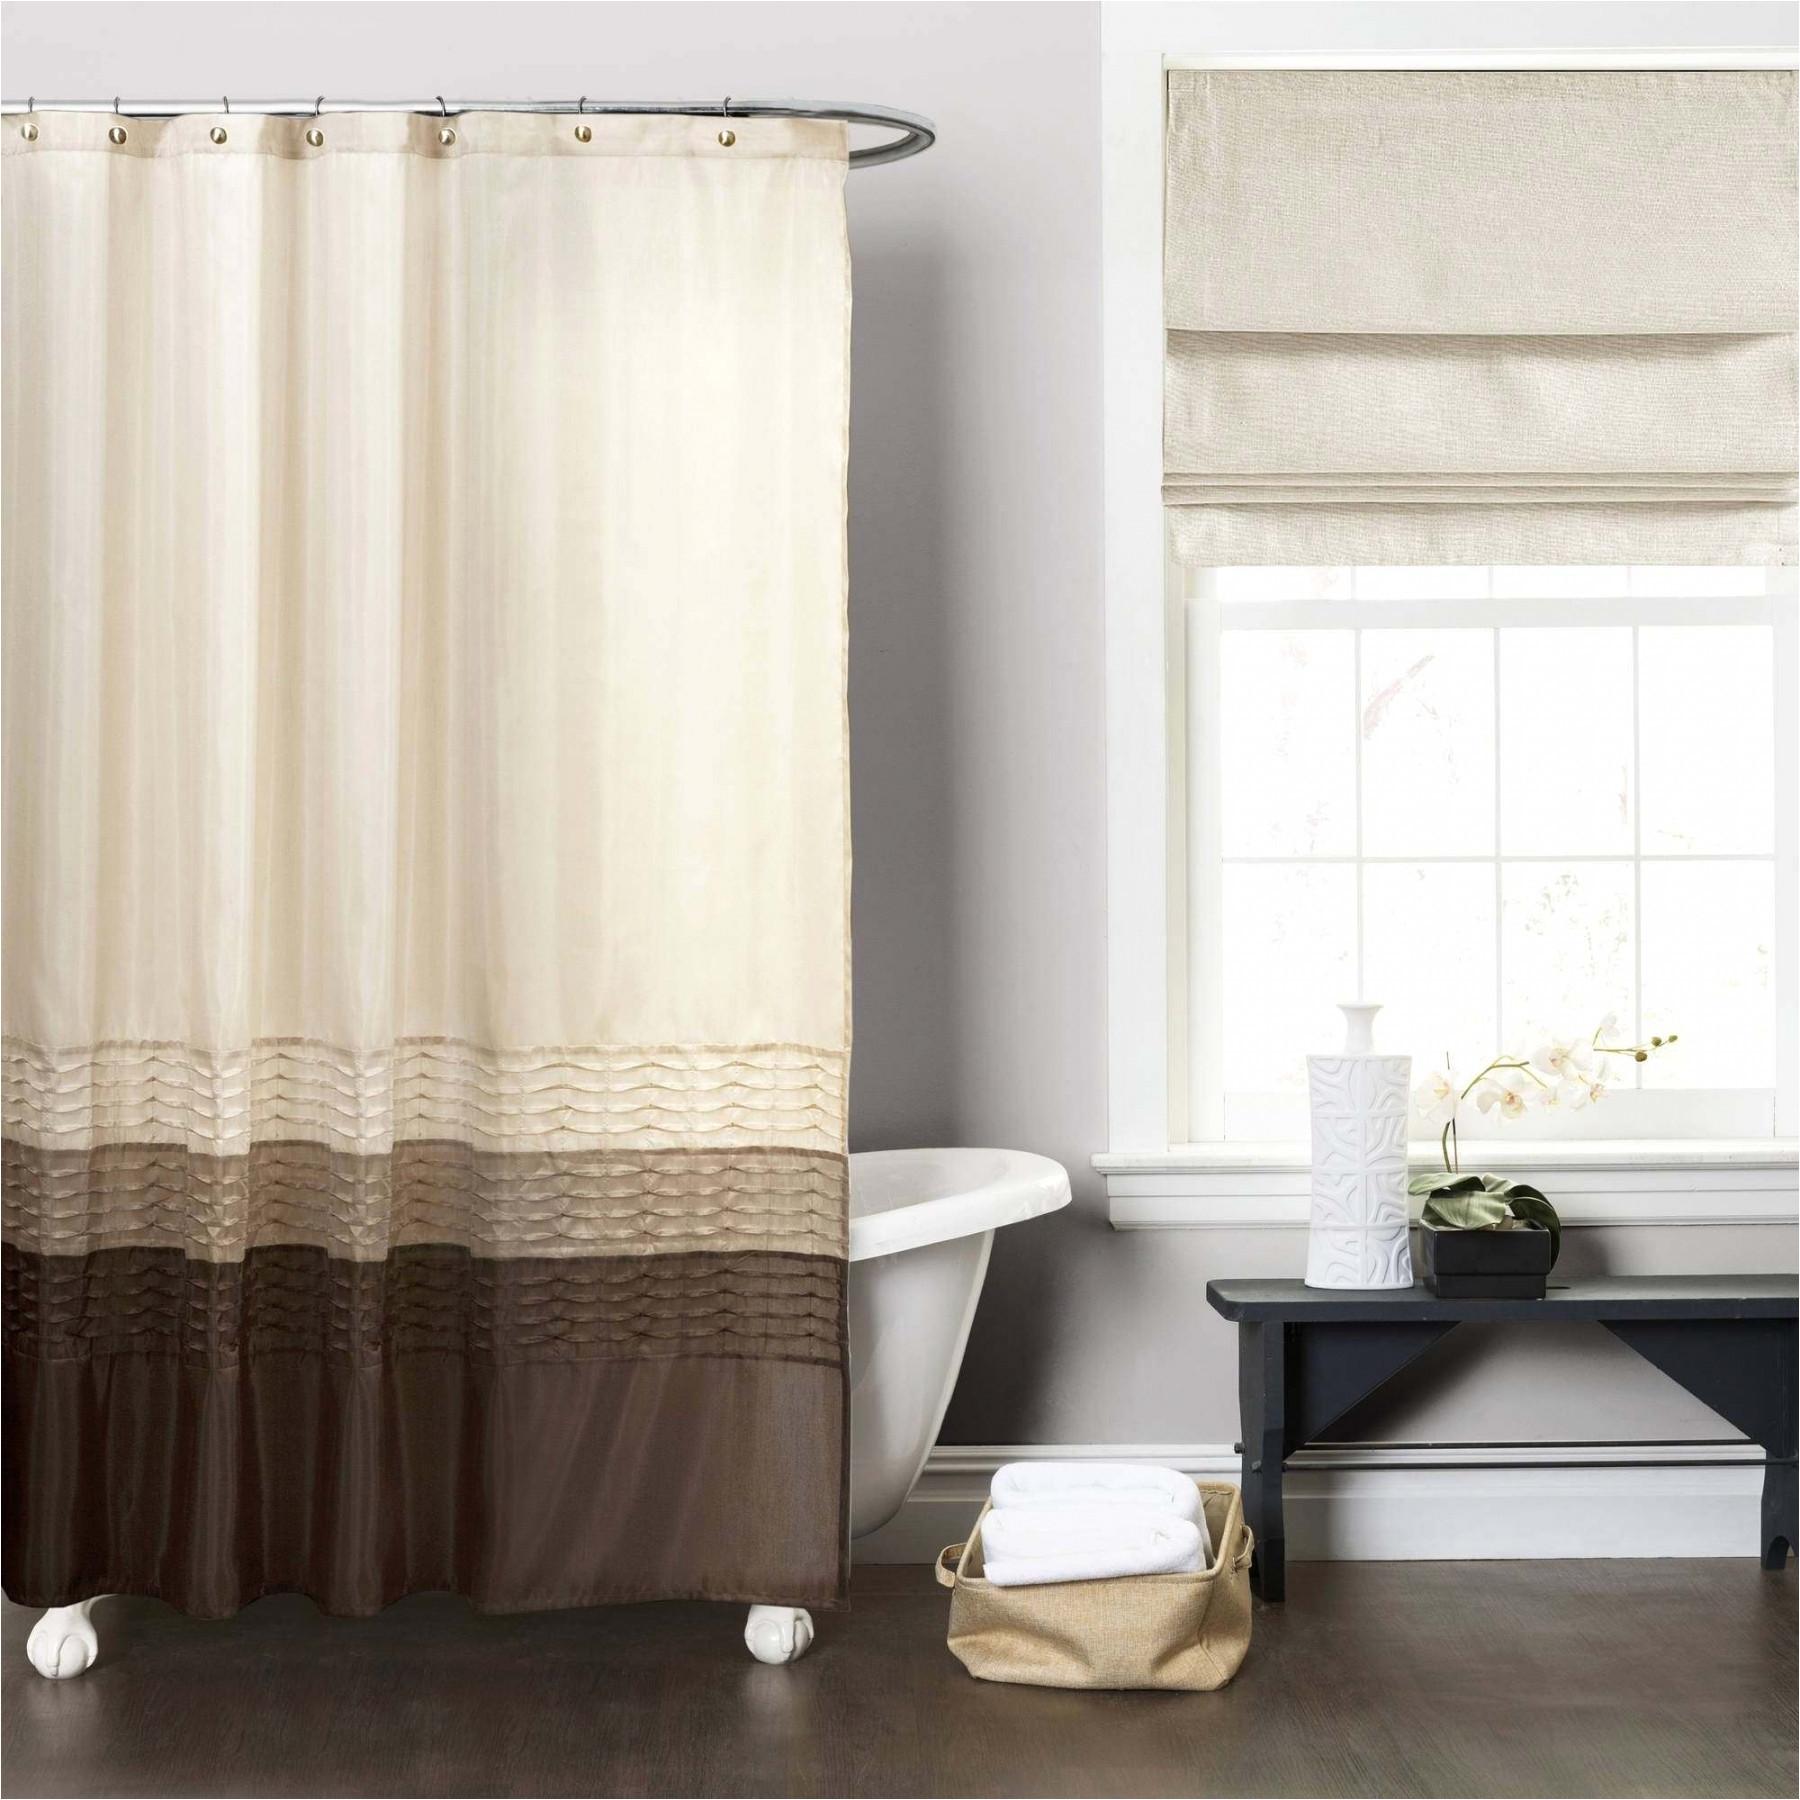 tree shower curtain ideas haccptemperature